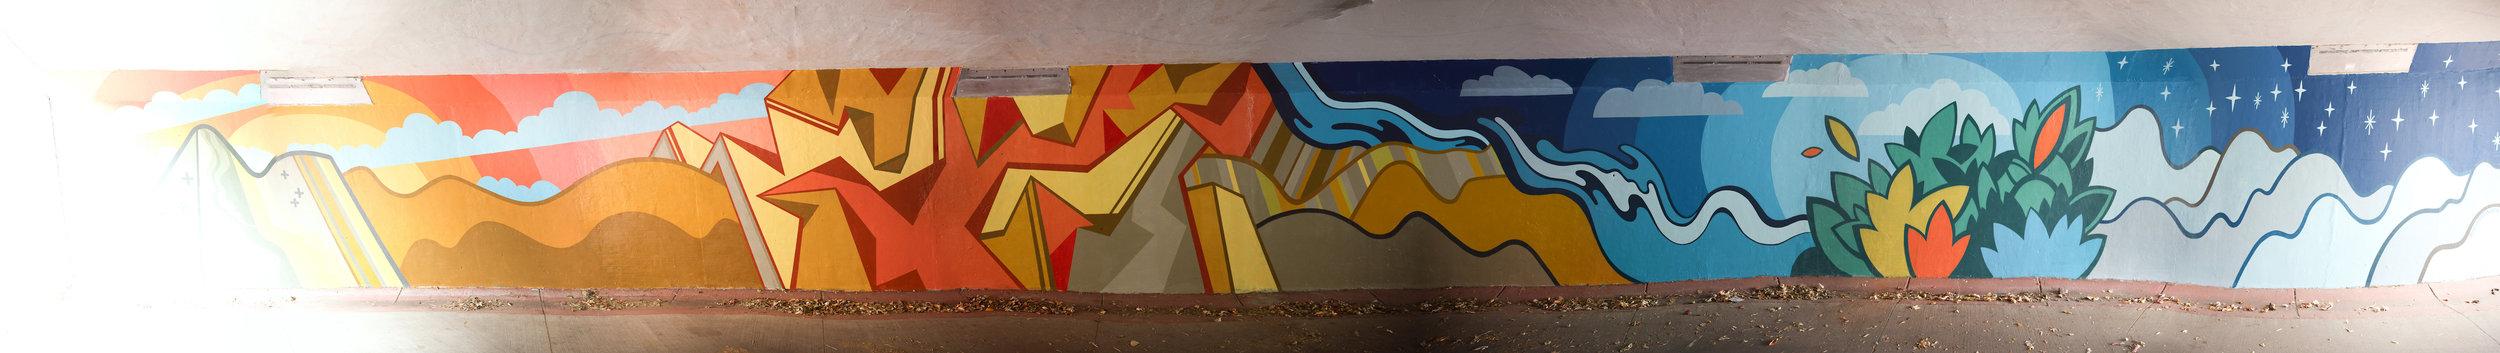 David Polka mural @ Moorhead underpass on the Bear Creek Bike Path. 2017 Boulder, CO